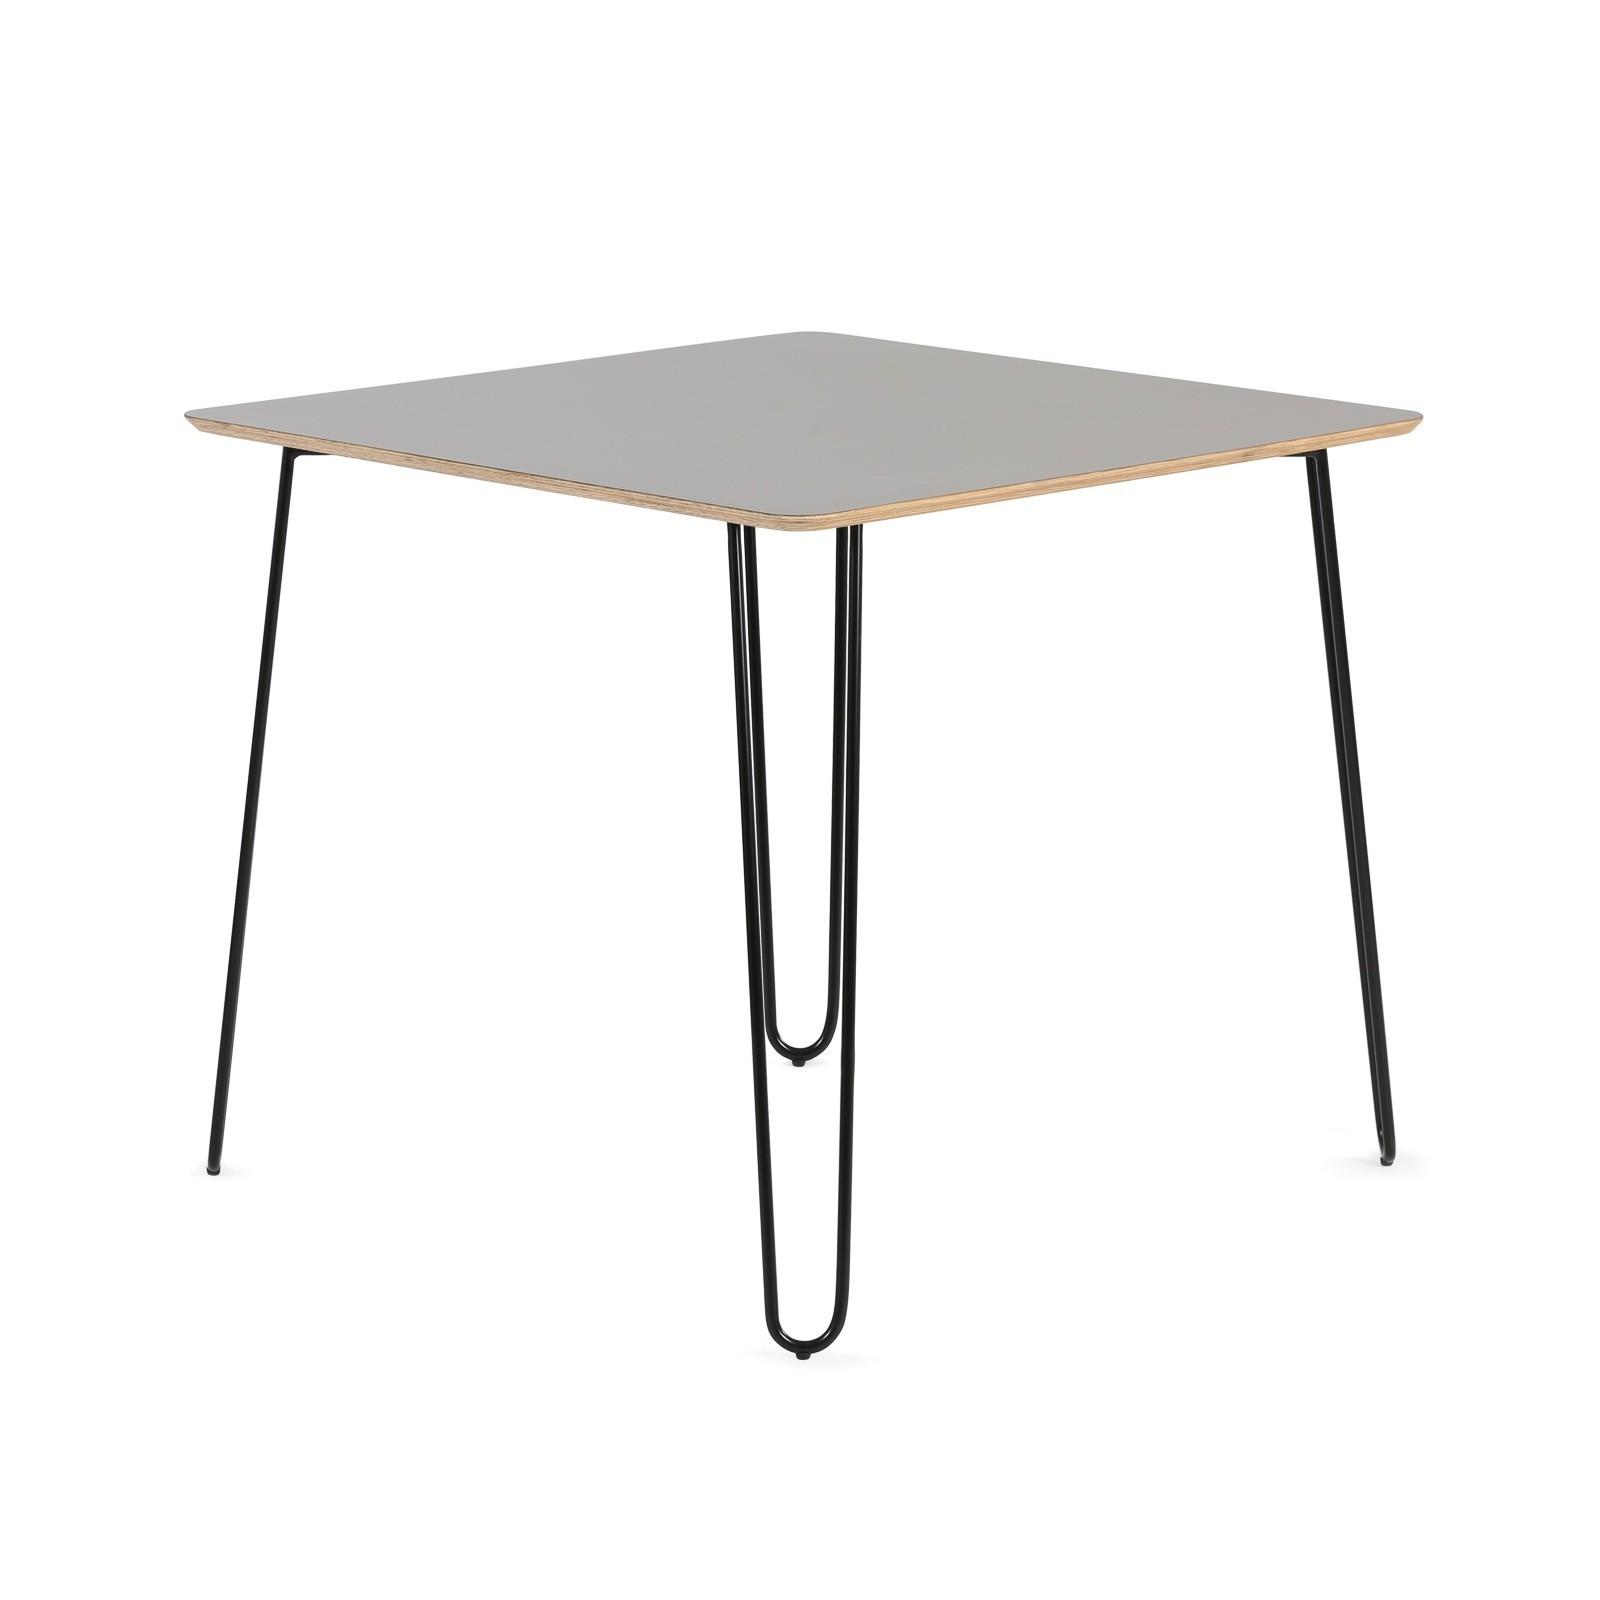 Stół Mannequin - MQ 03 - szary